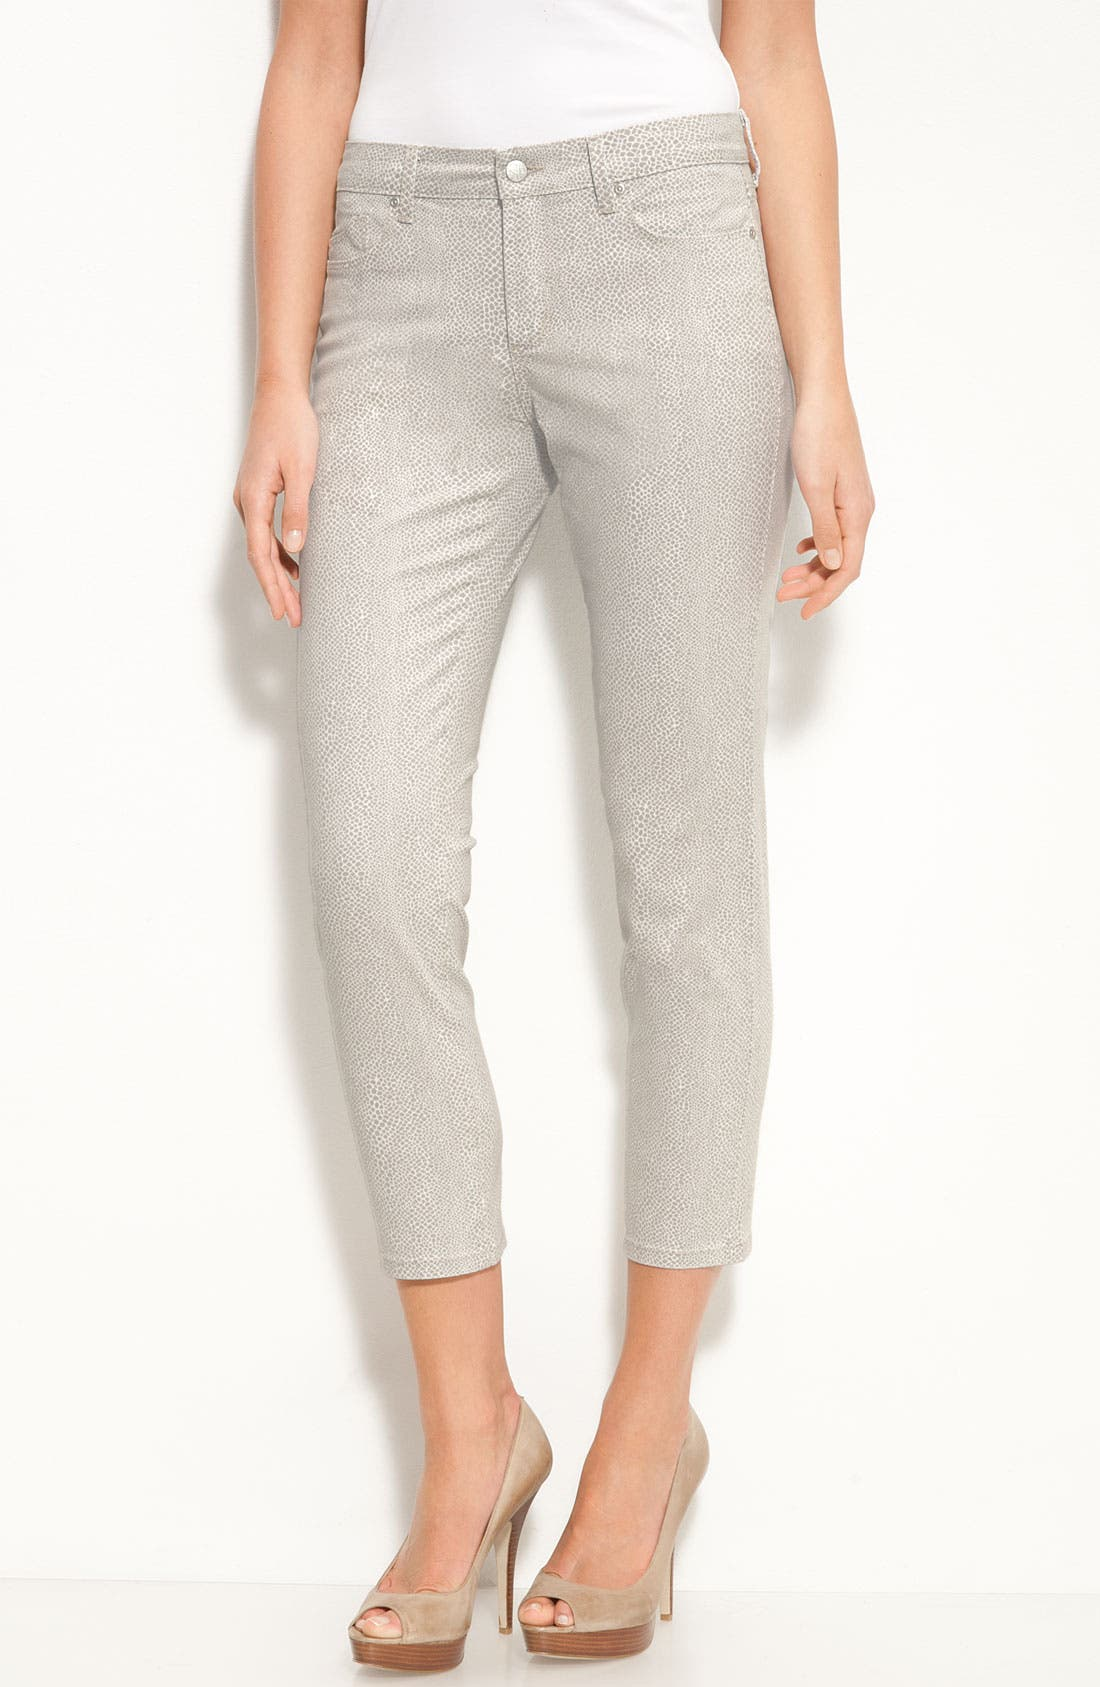 Alternate Image 1 Selected - NYDJ 'Alisha' Print Skinny Stretch Jeans (Petite)